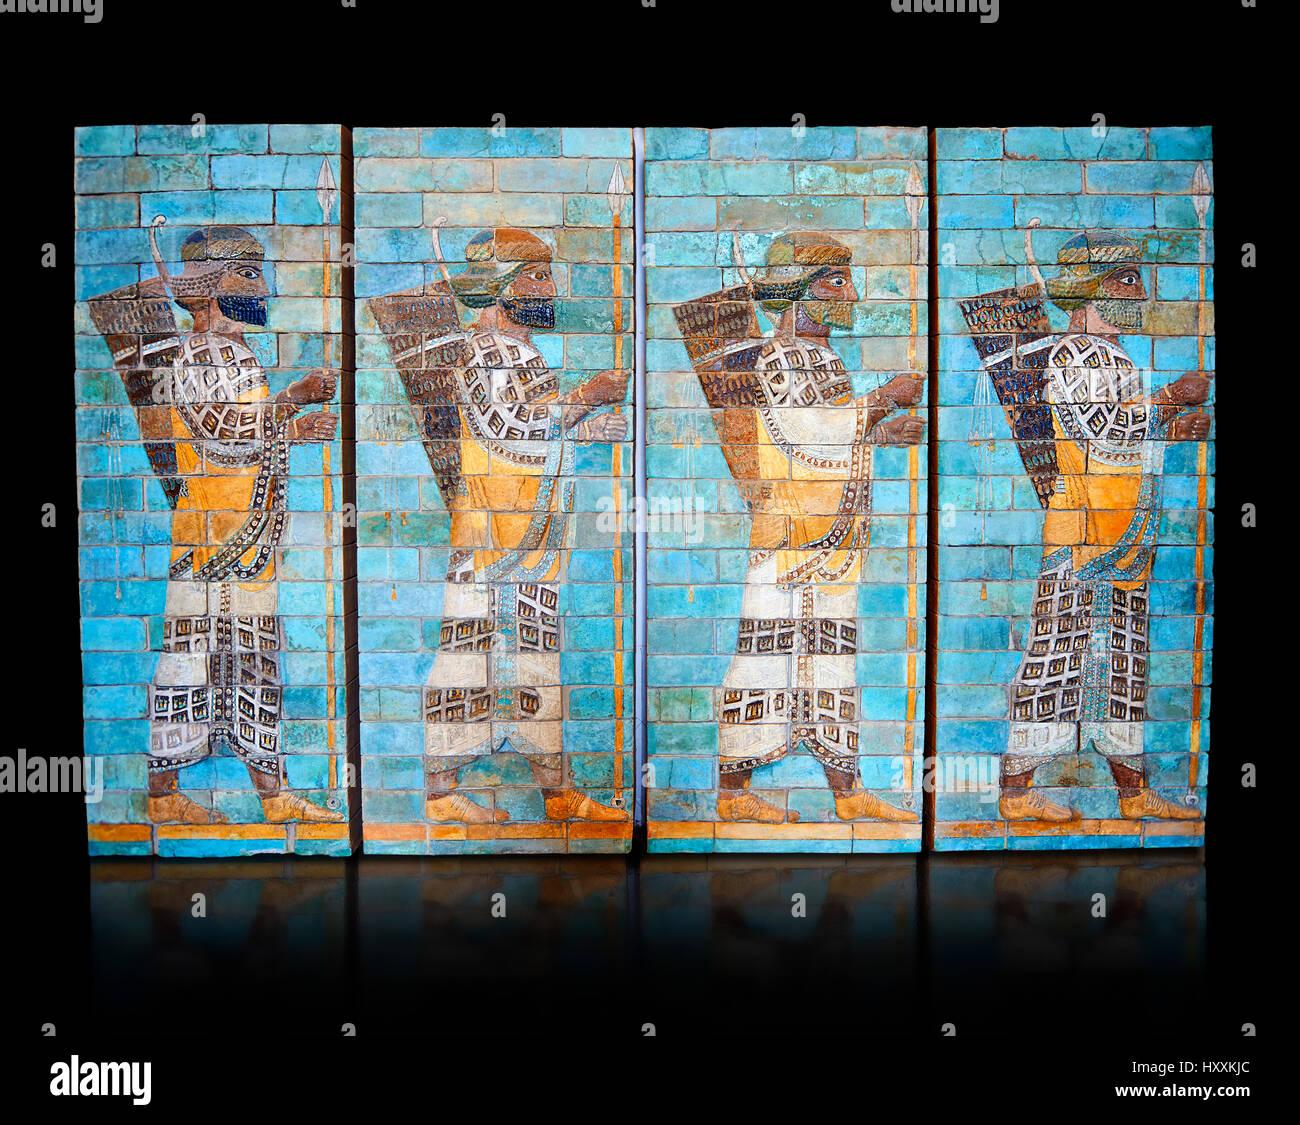 Glazed terracotta brick panels depicting Achaemenid Persian archers. Reign of Darius 1st, First Persian Empire, - Stock Image